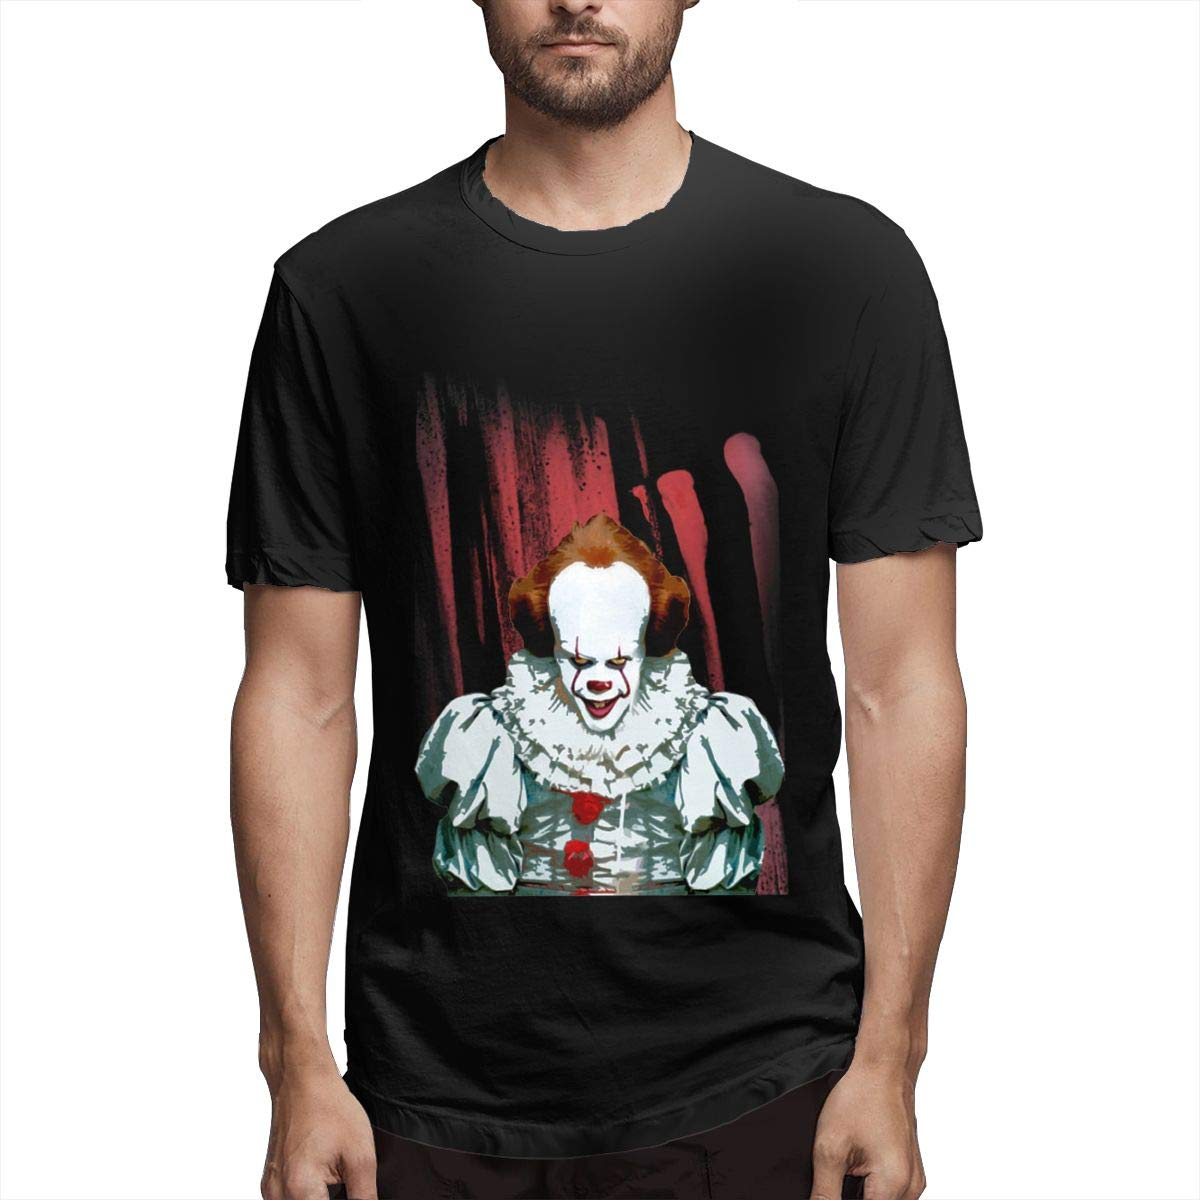 Troom 2019 It Chapter 2 Custom S Black Unisex Shirts